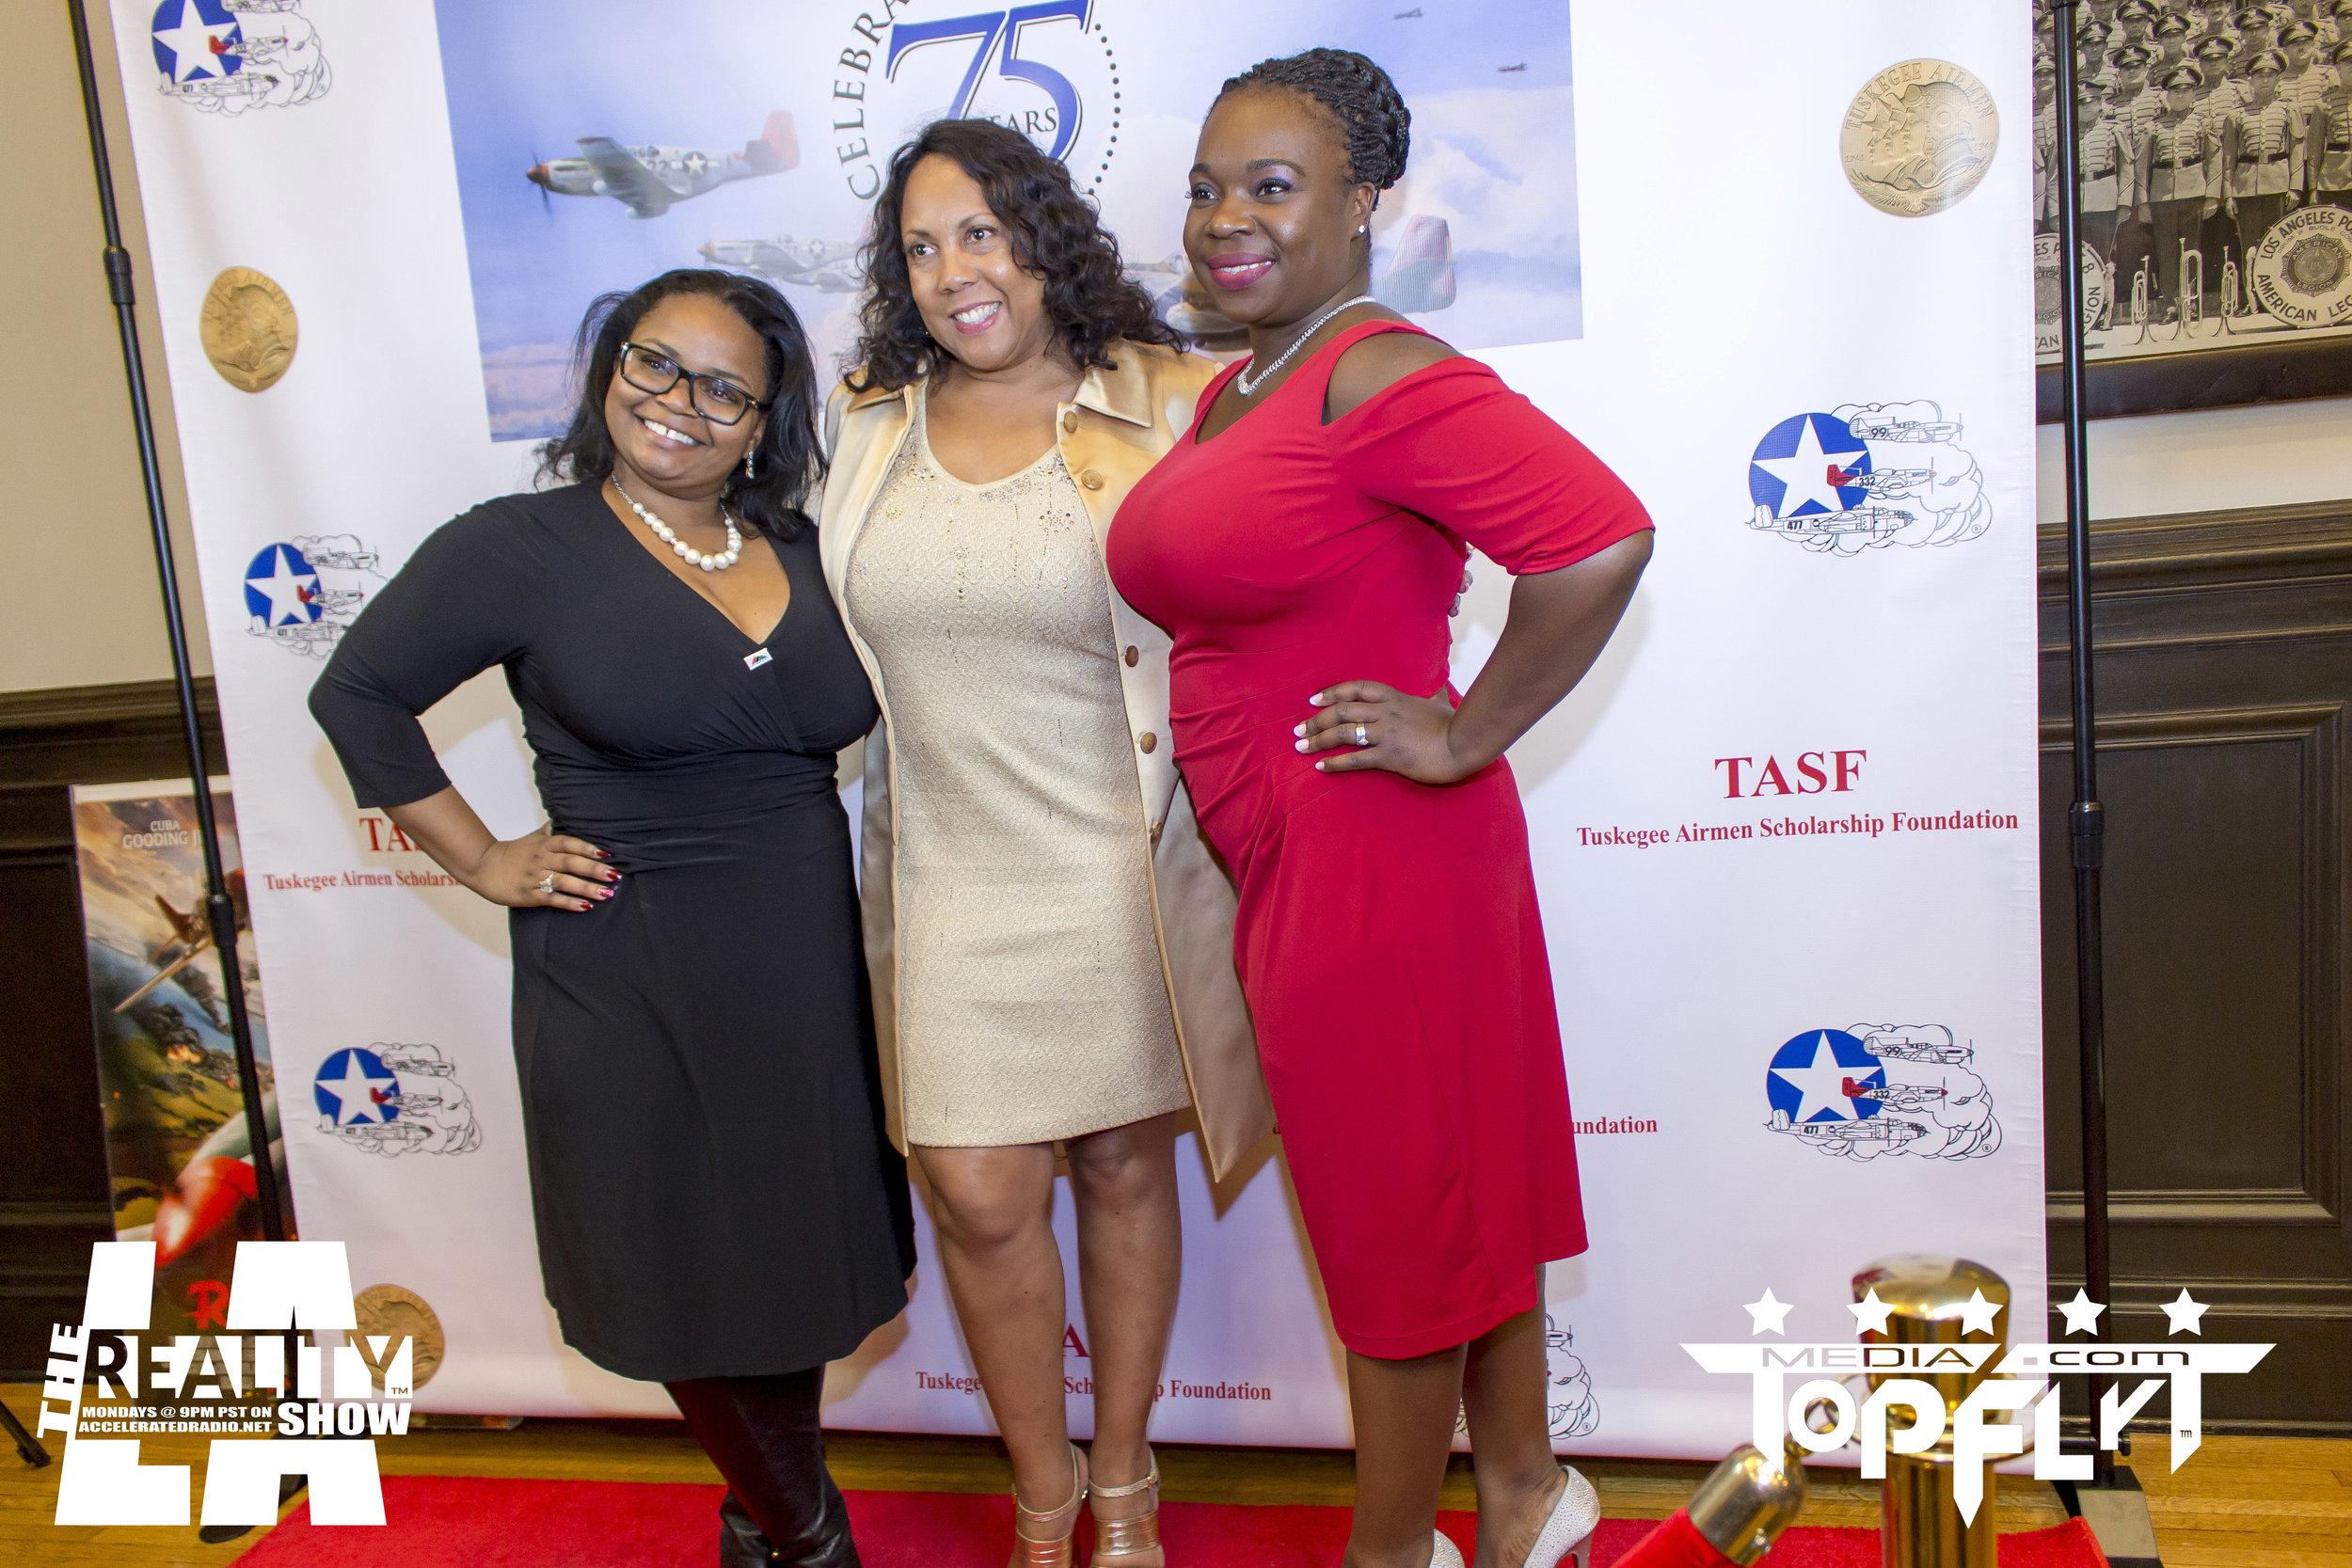 The Reality Show LA - Tuskegee Airmen 75th Anniversary VIP Reception_90.jpg